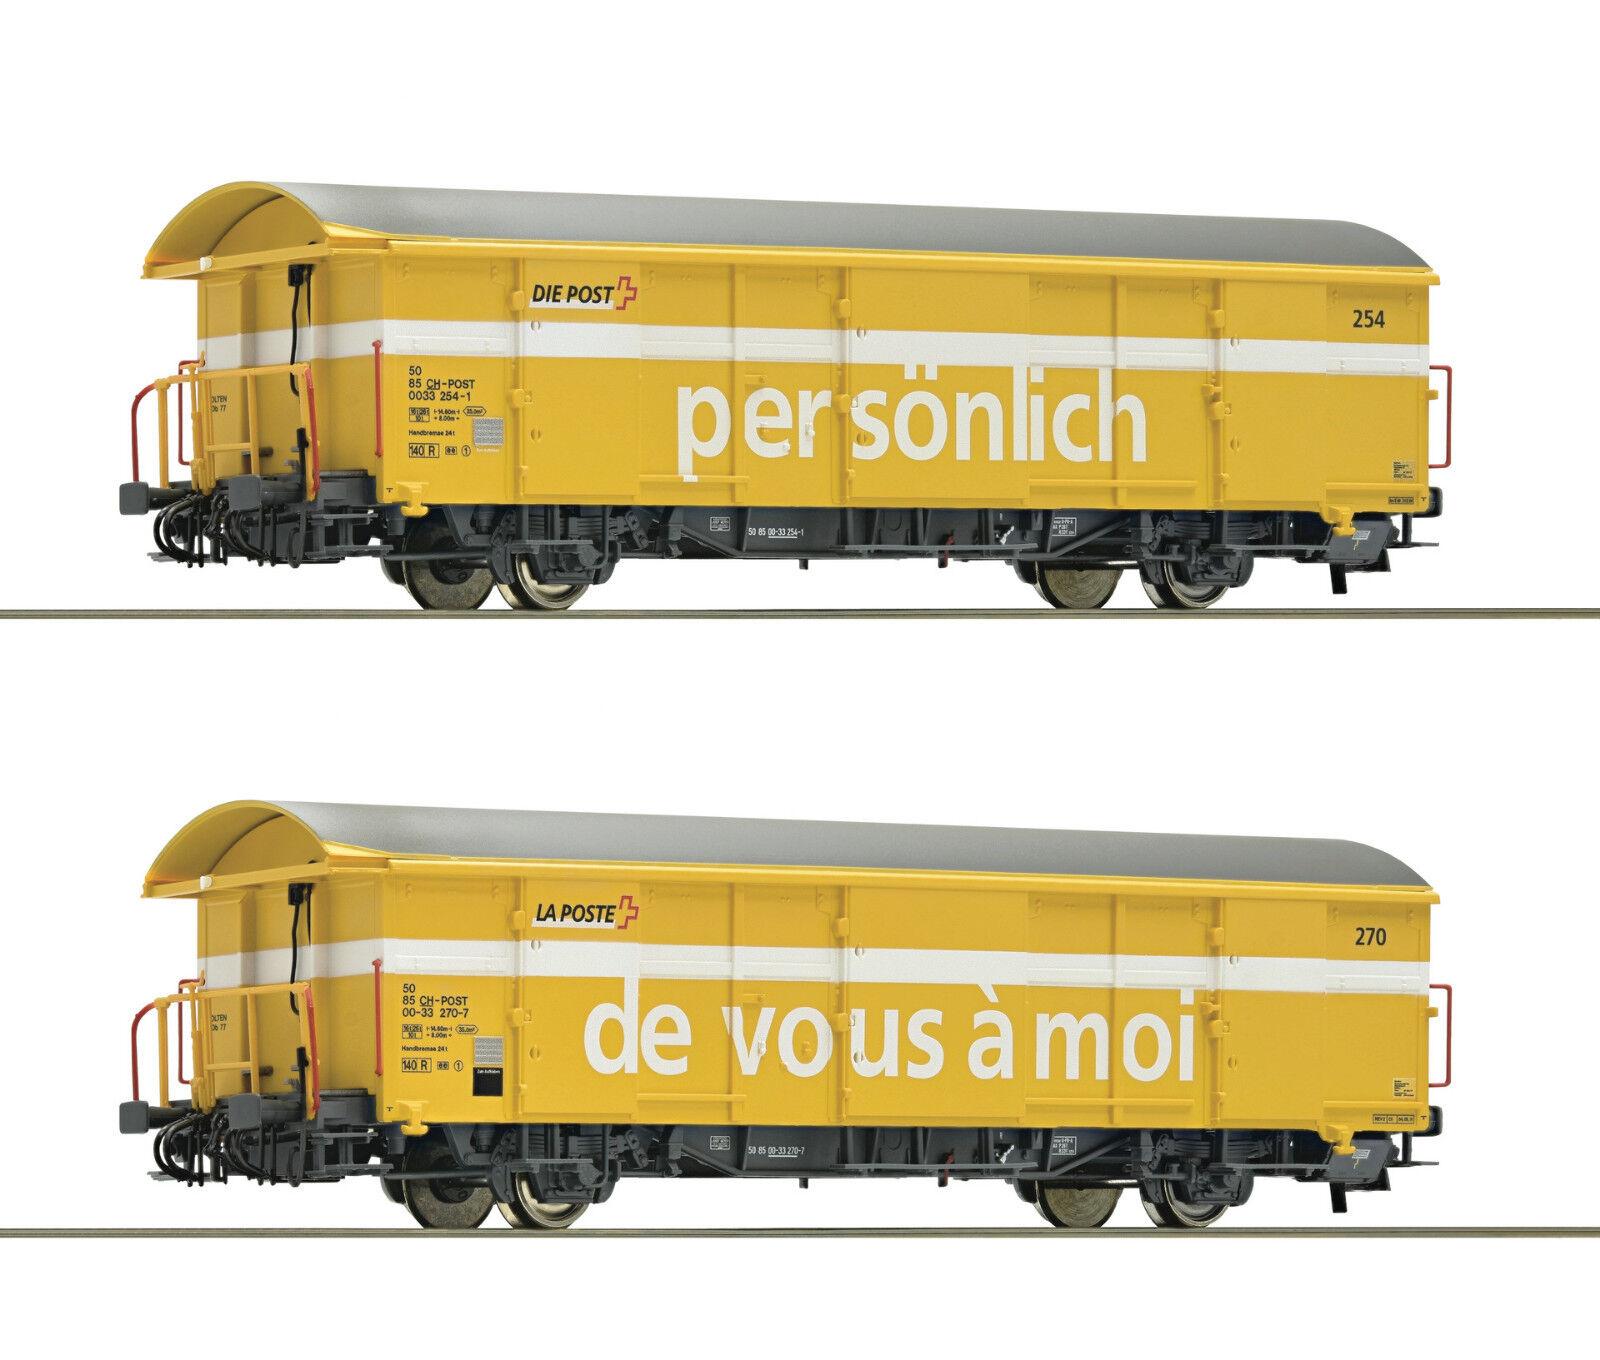 Roco 67183 set 2 carro postal SBB PE 5-6 a petición achstausch para Märklin gratis